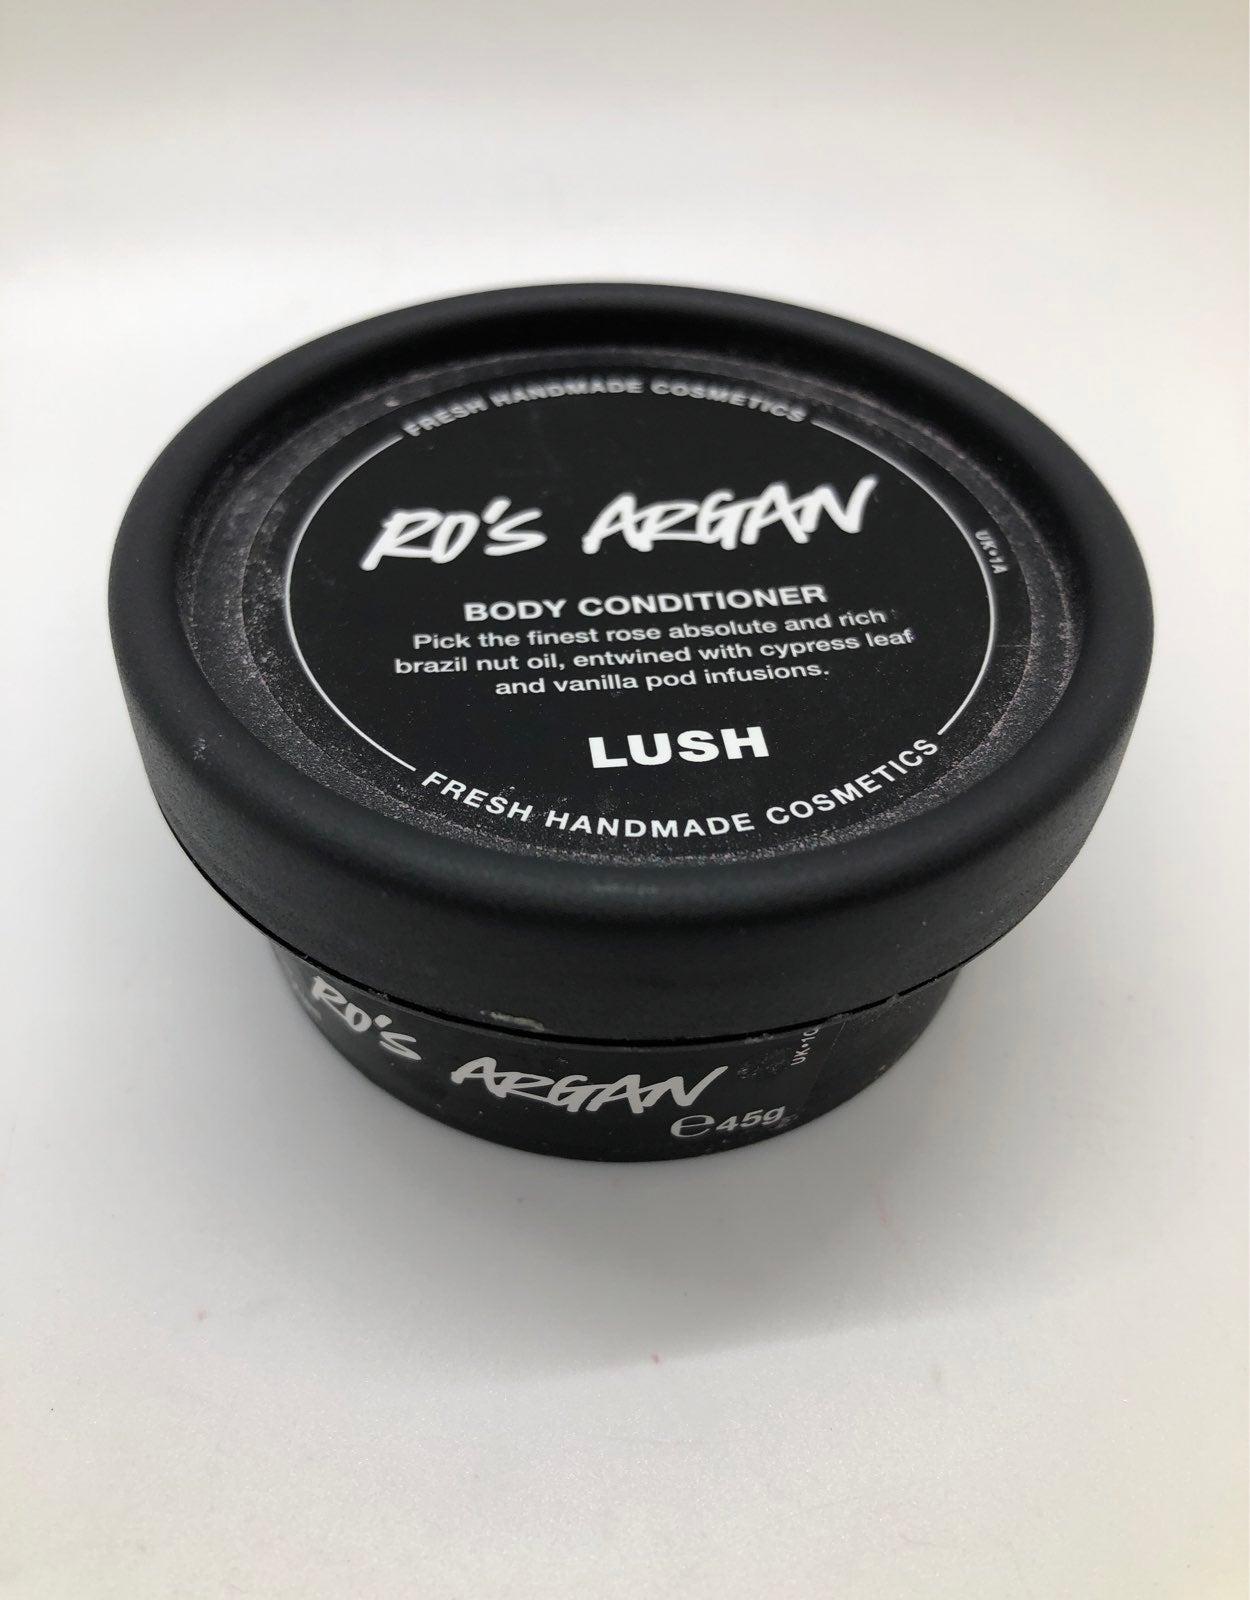 lush cosmetic ros argan body conditioner